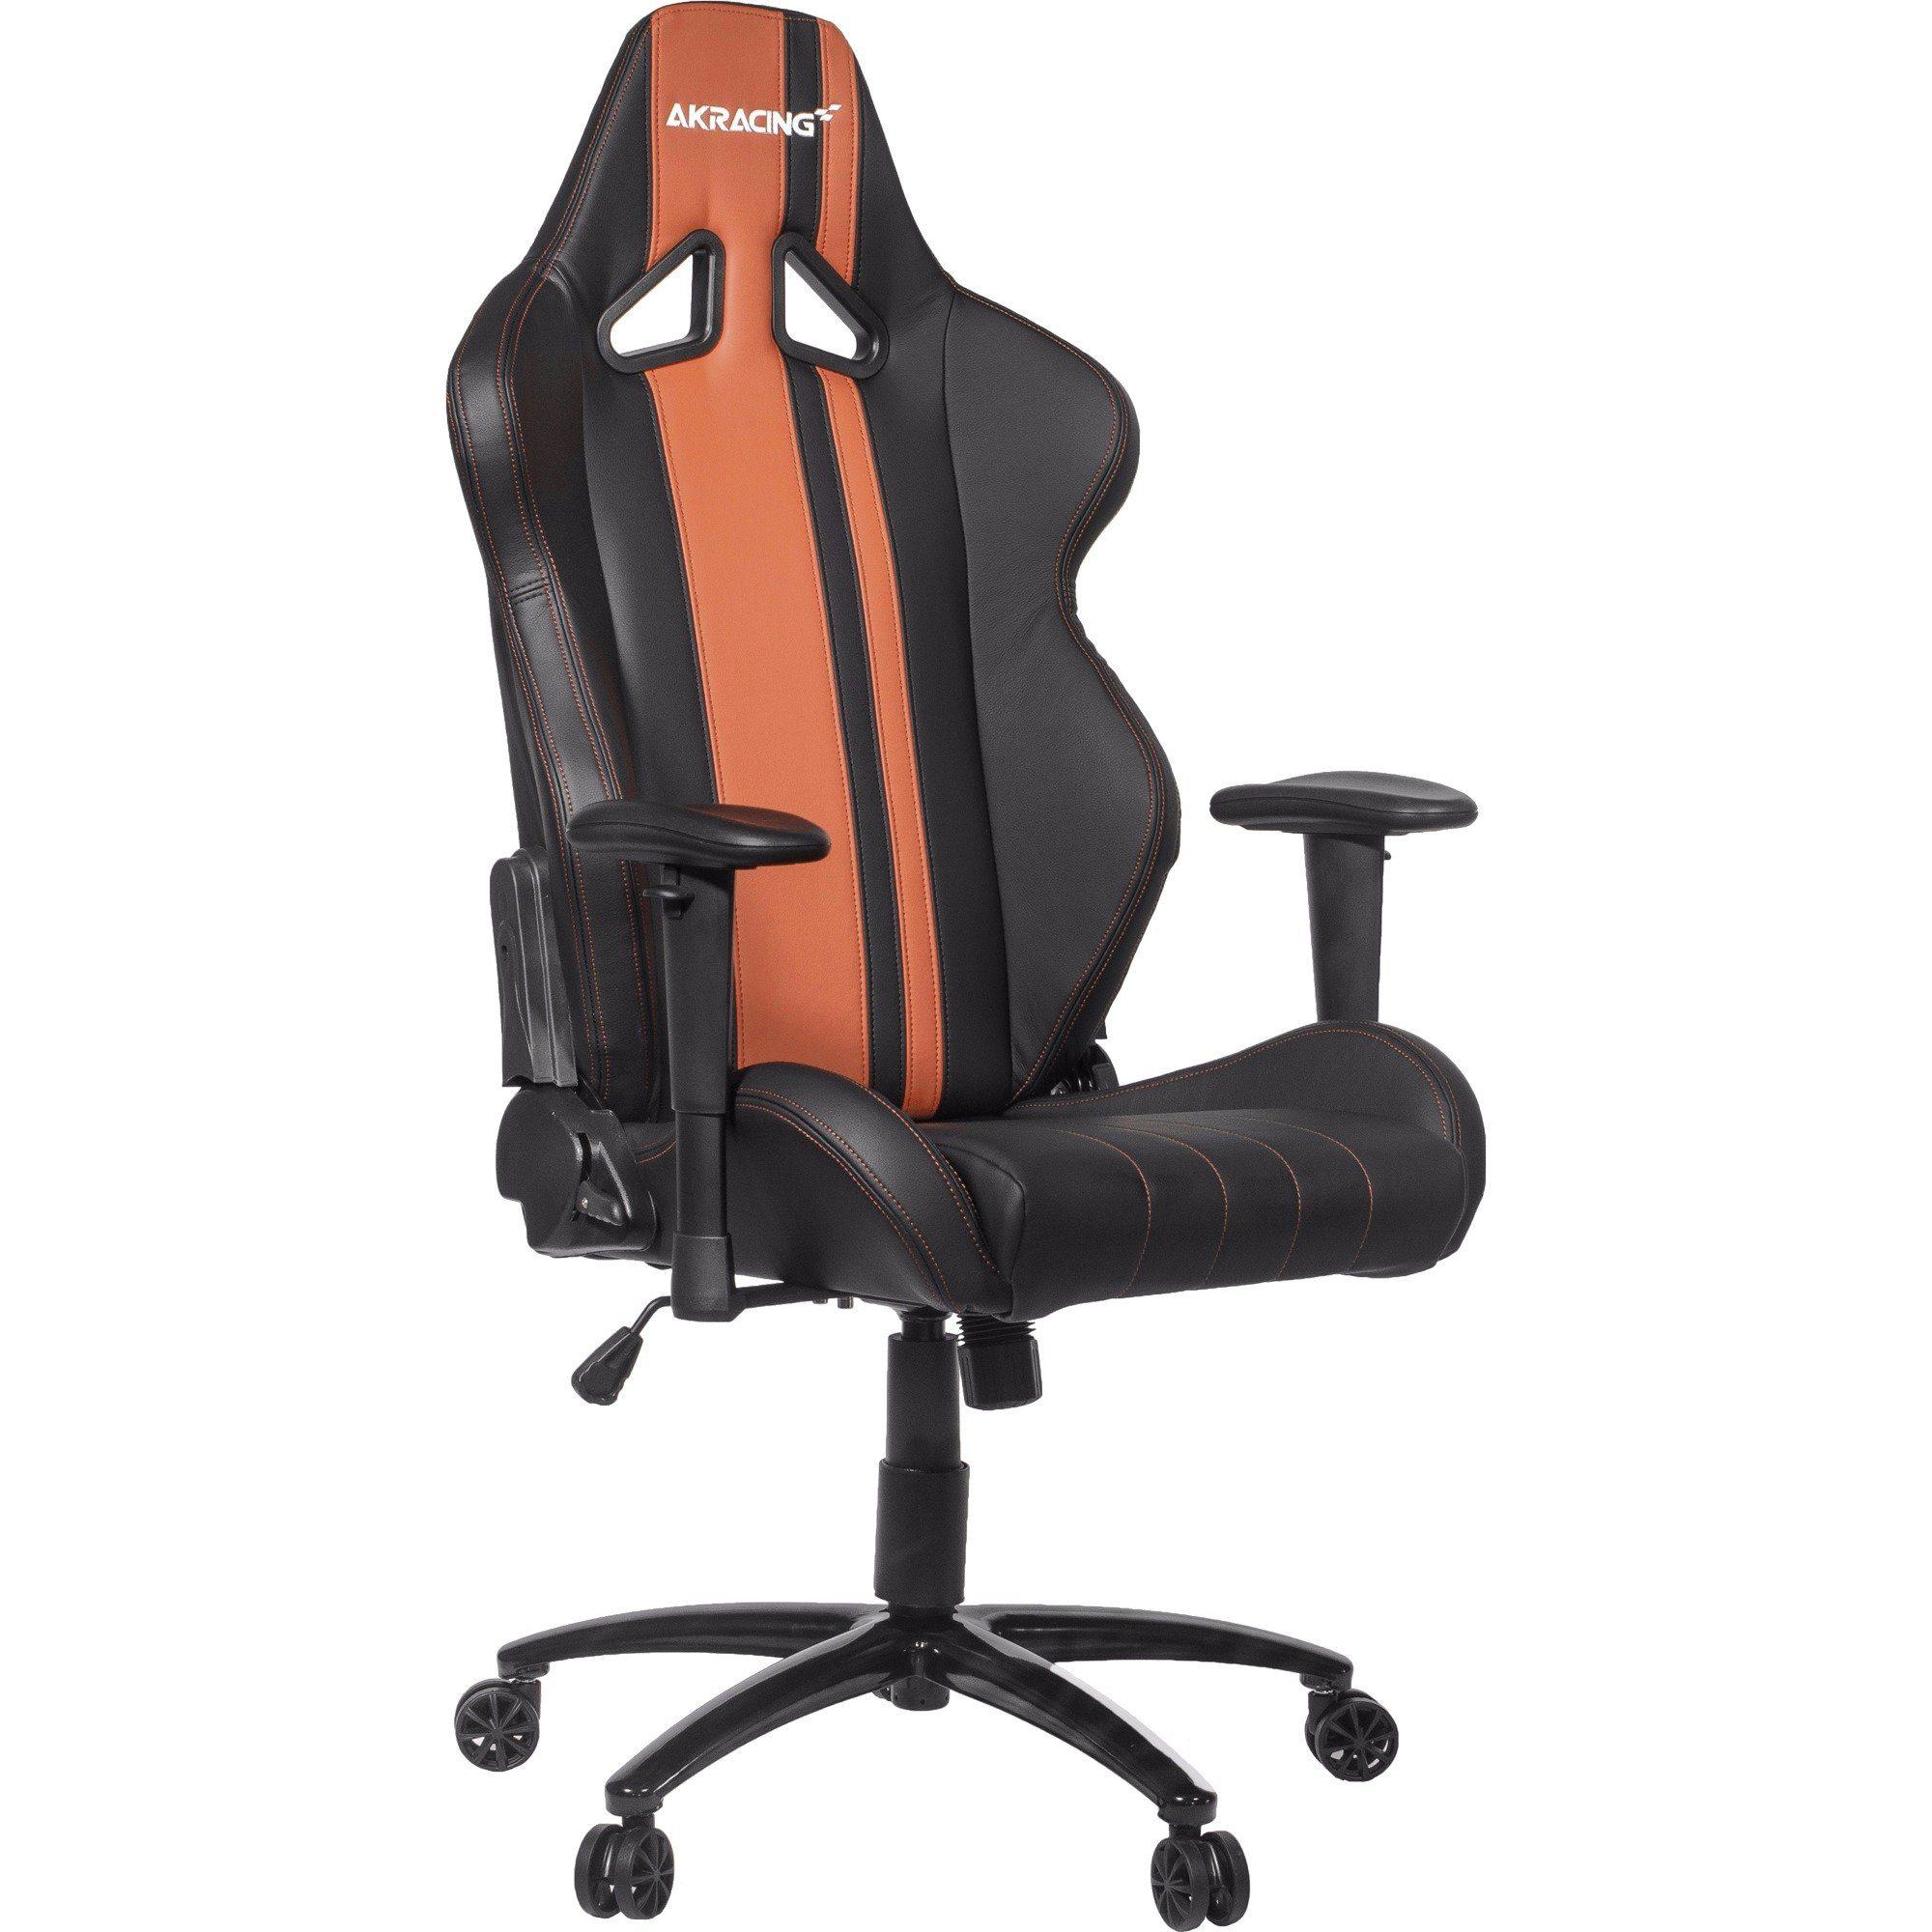 AKRACING Spielsitz »Rush Gaming Chair«